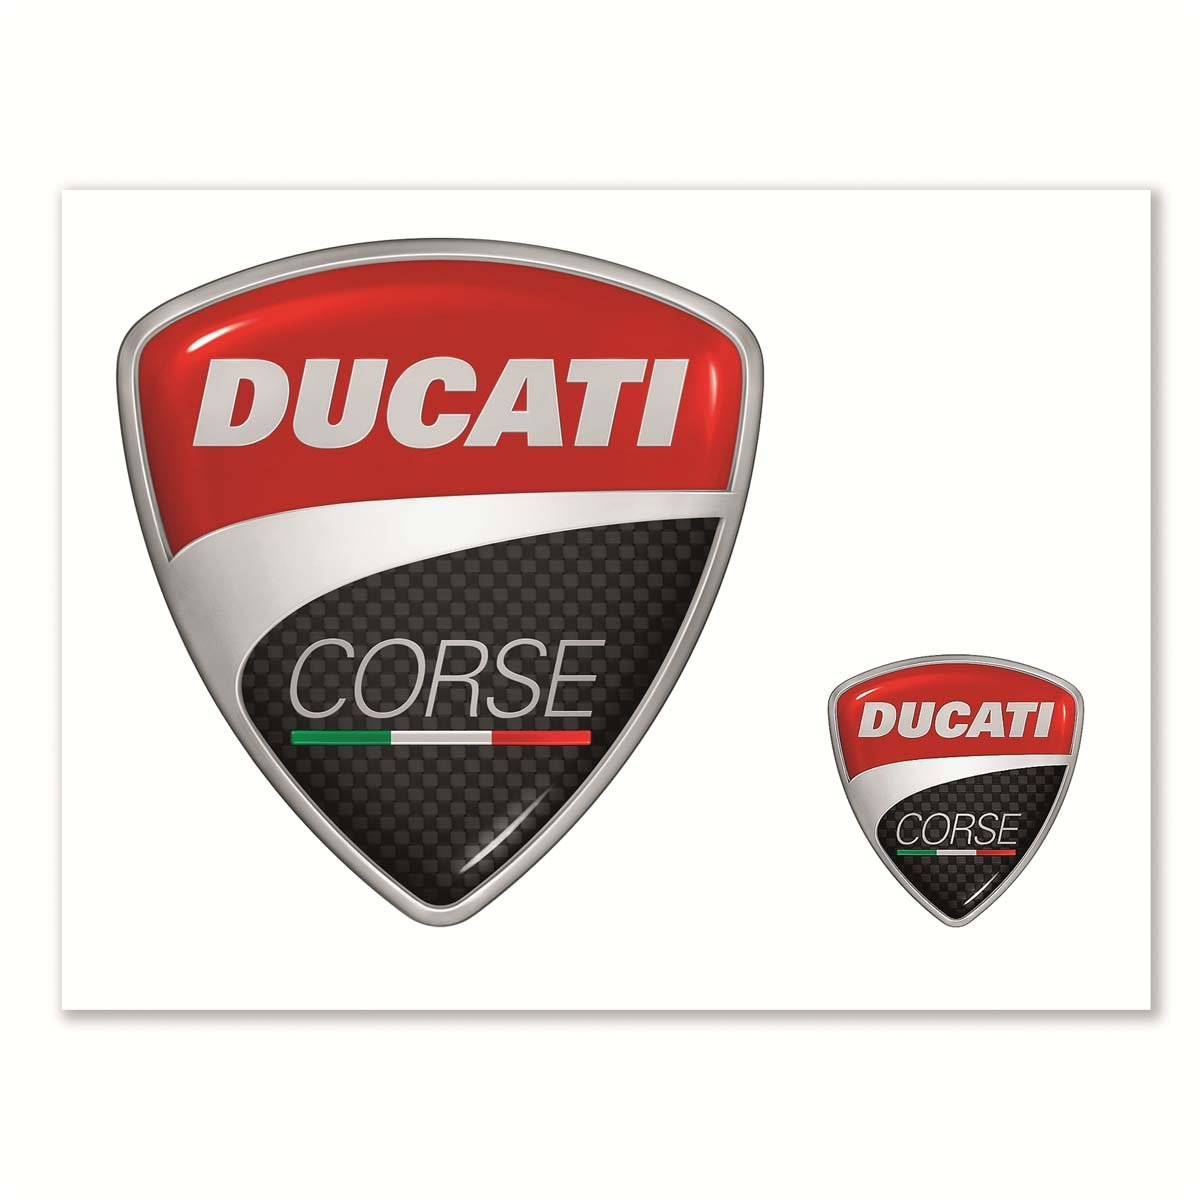 Ducati Corse Logo Sticker Kit COMINU000852